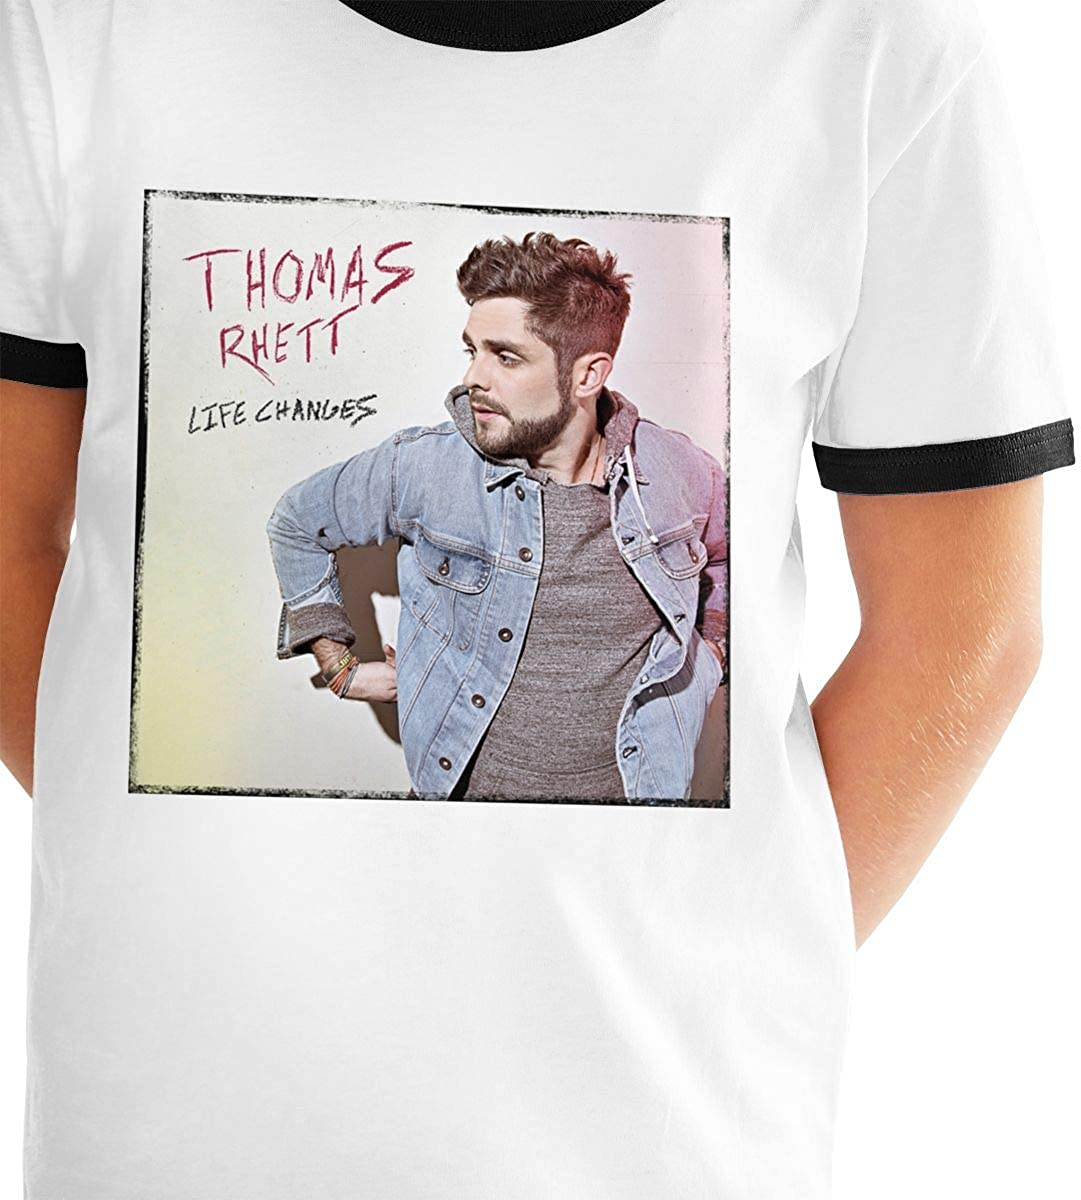 Thomas Rhett Life Changes Cotton Girls Boys T Shirt Children Youth Fashion Black